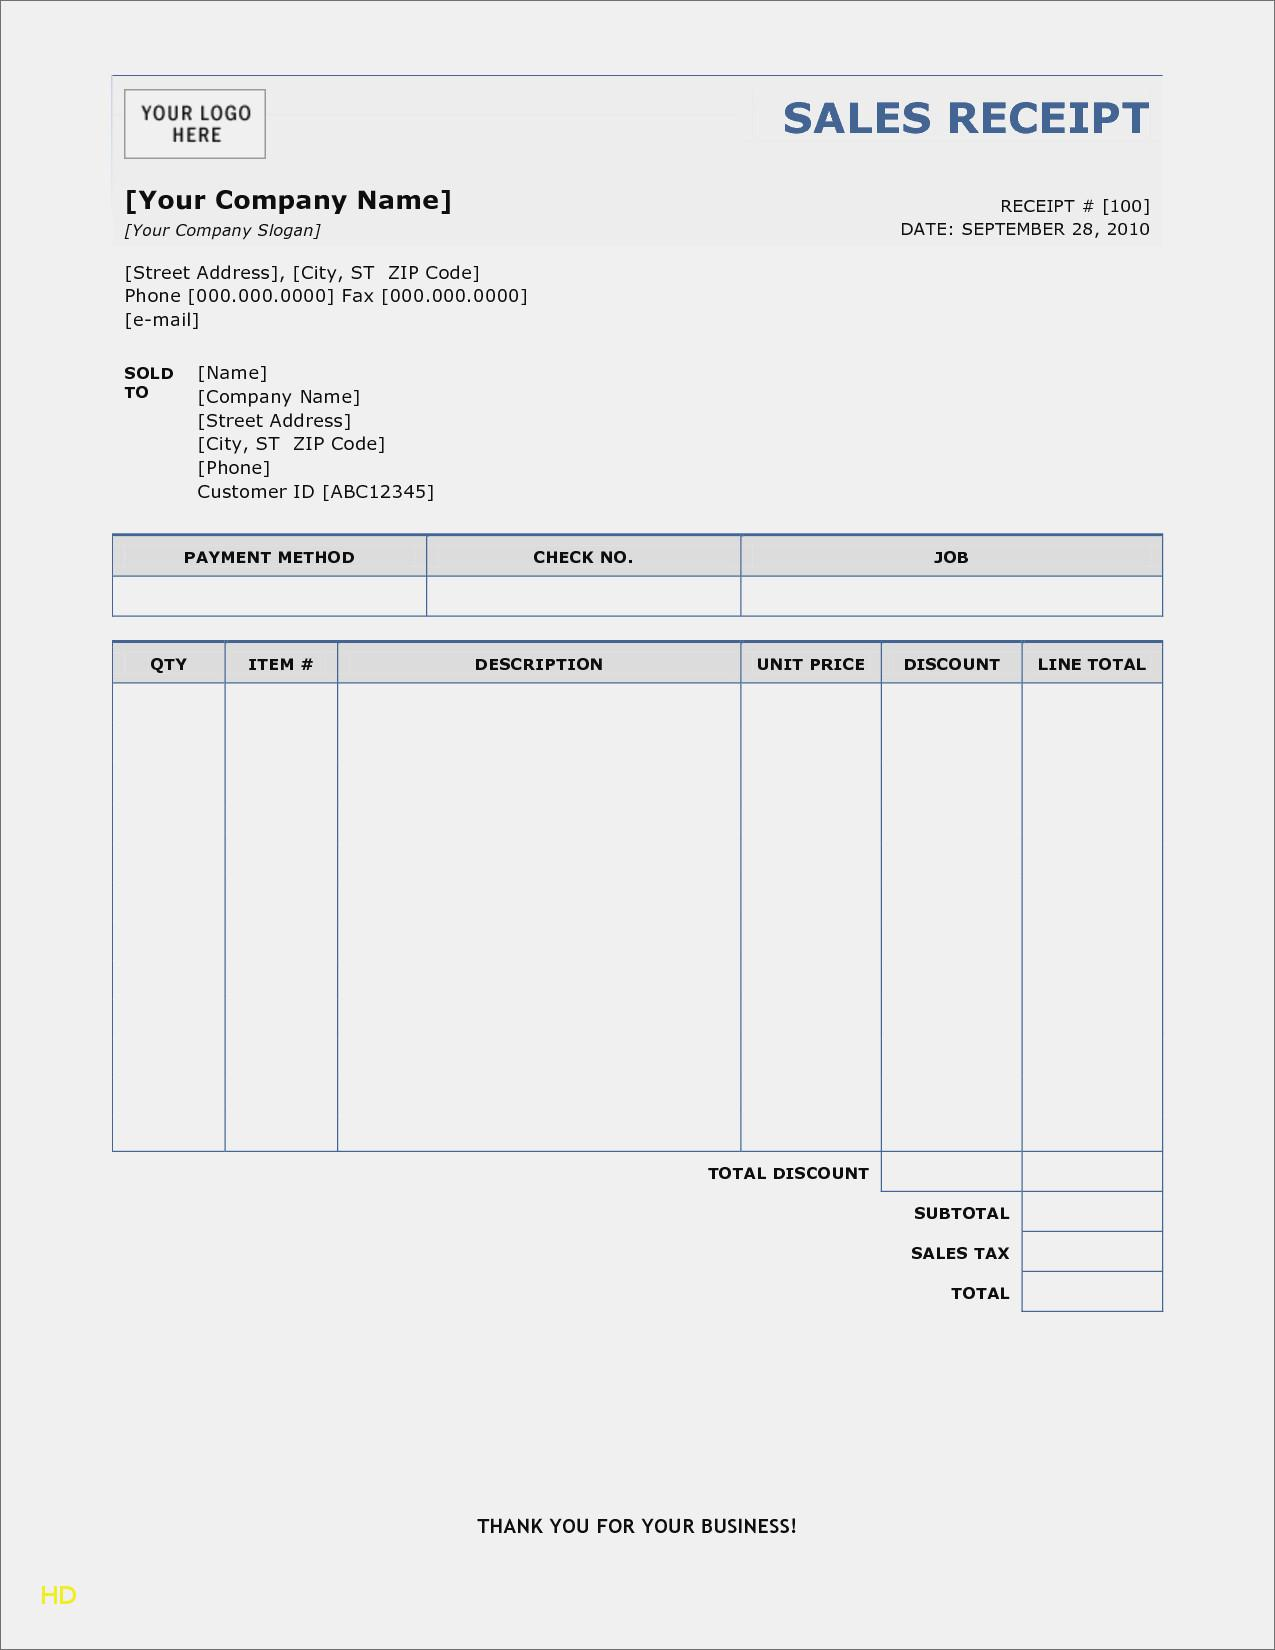 Example Sales Receipt